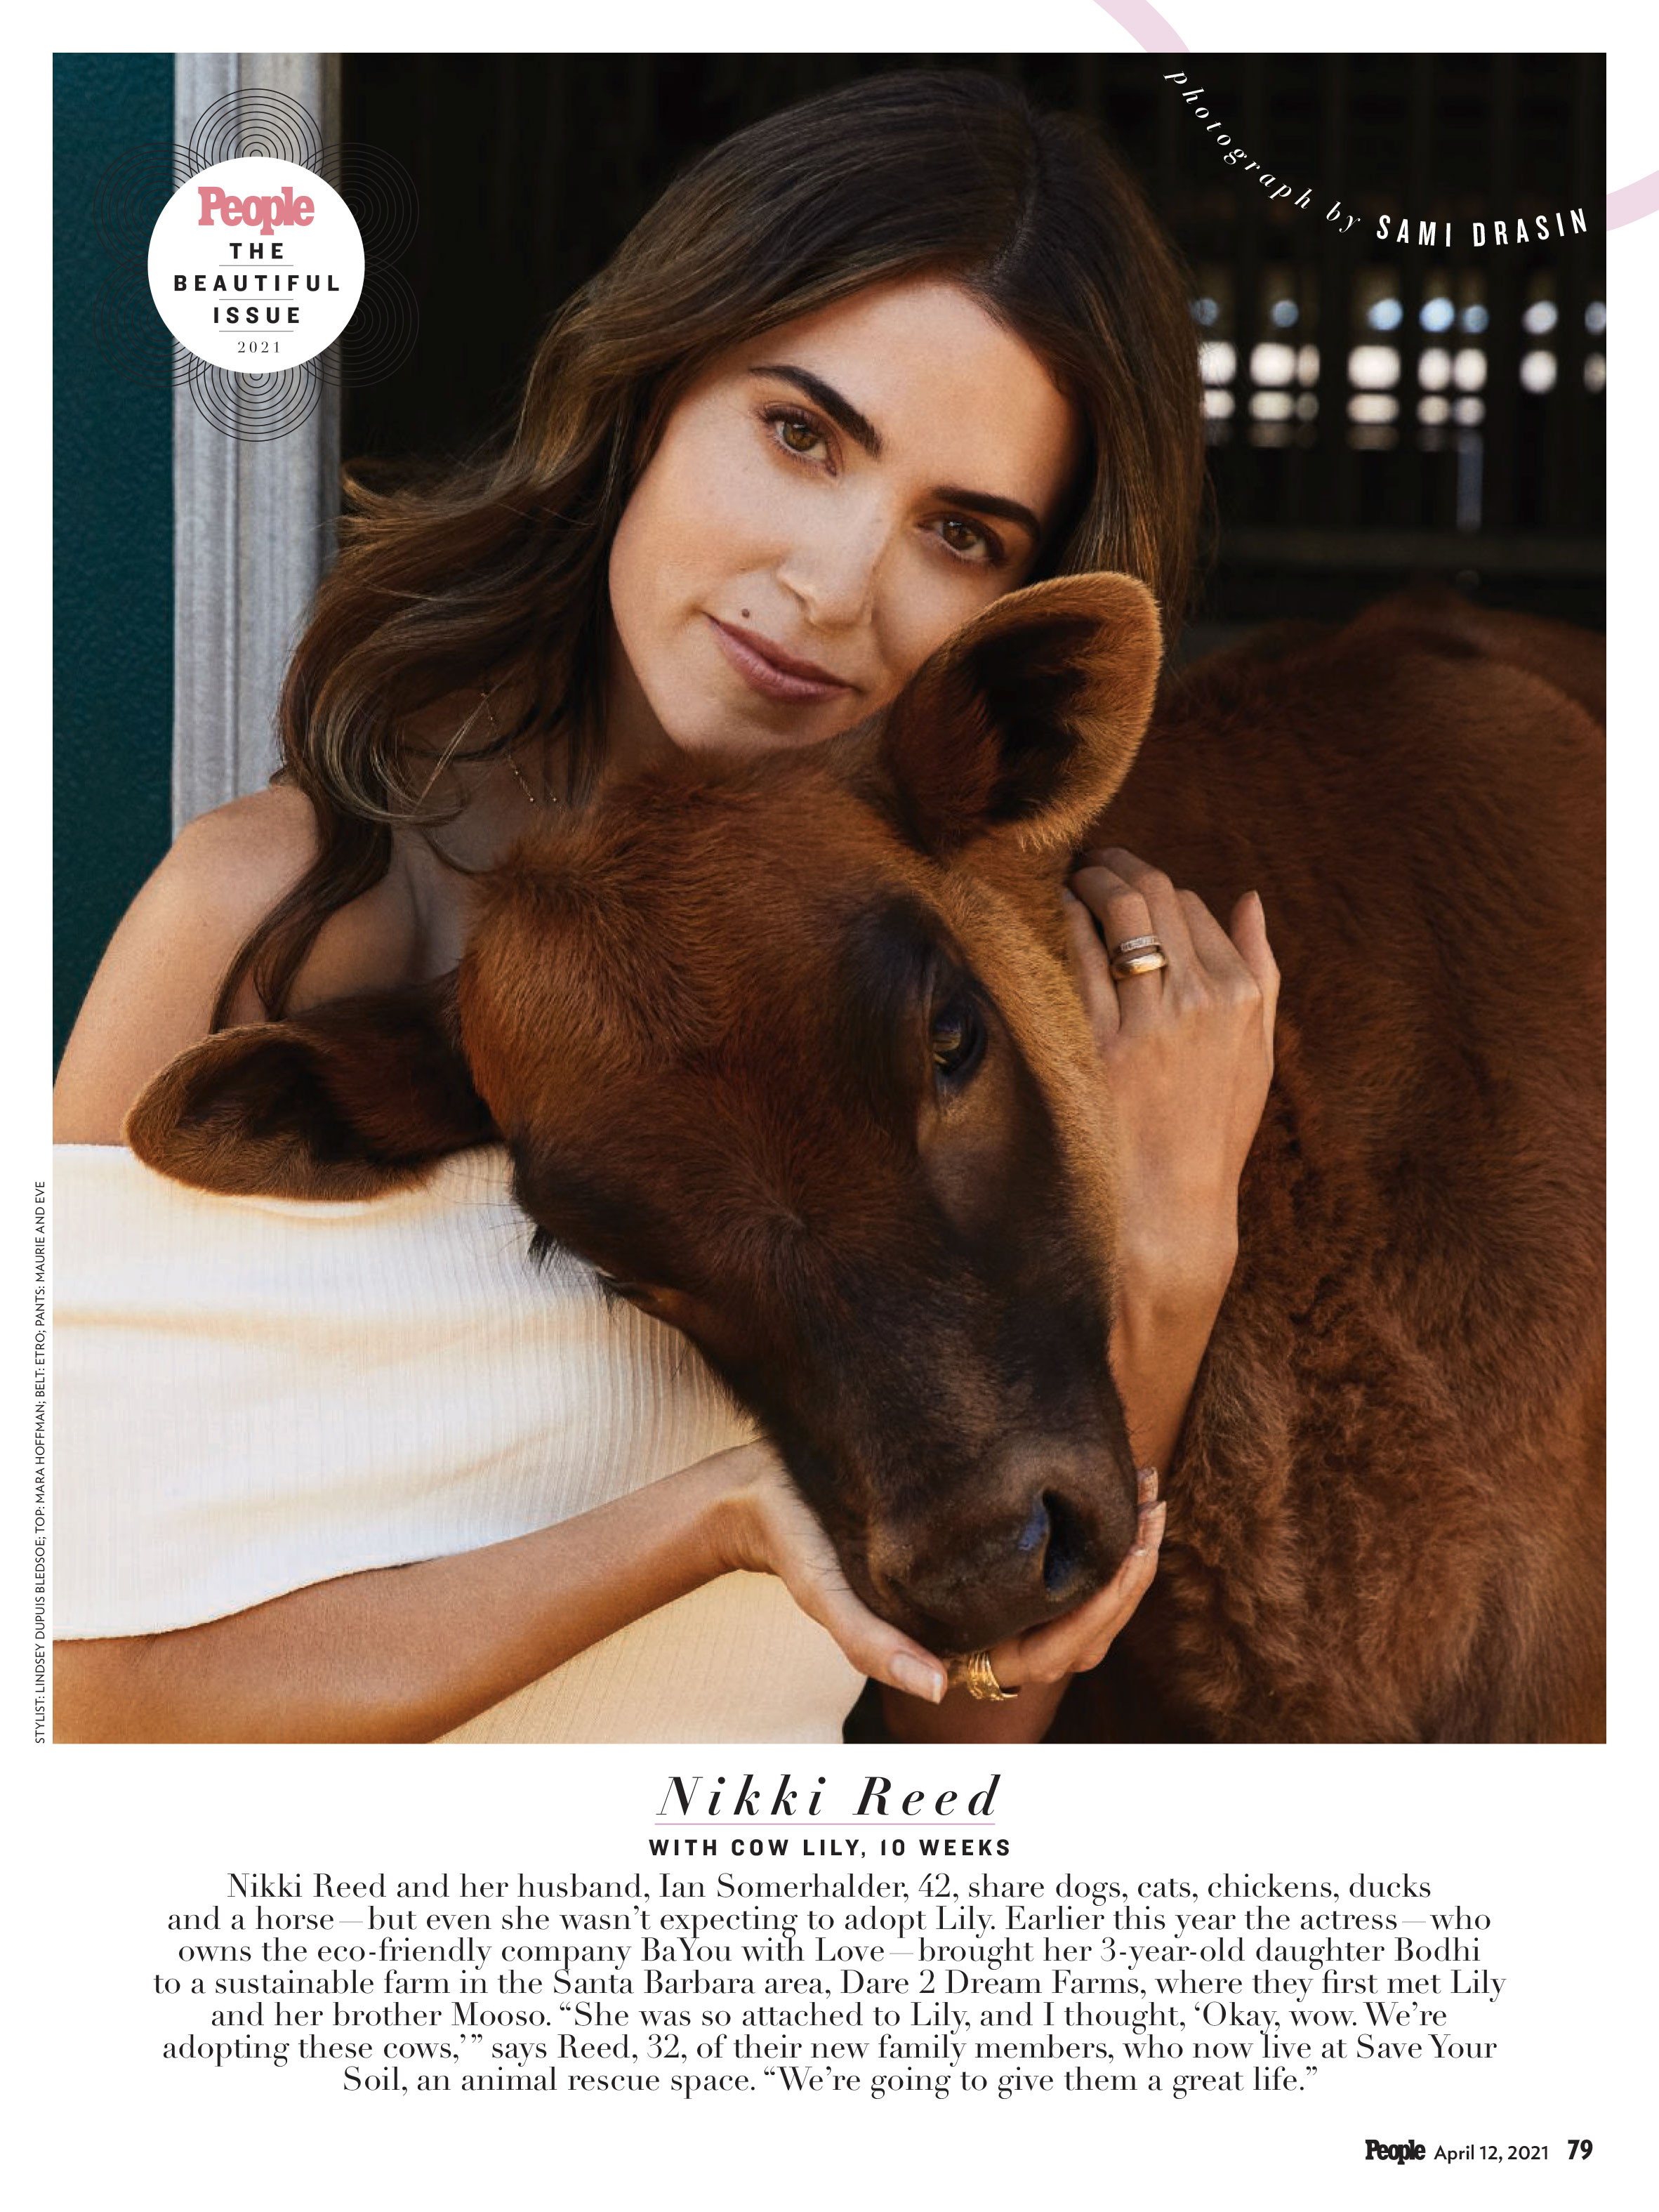 People Magazine Beautiful Issue 2020 - Nikki